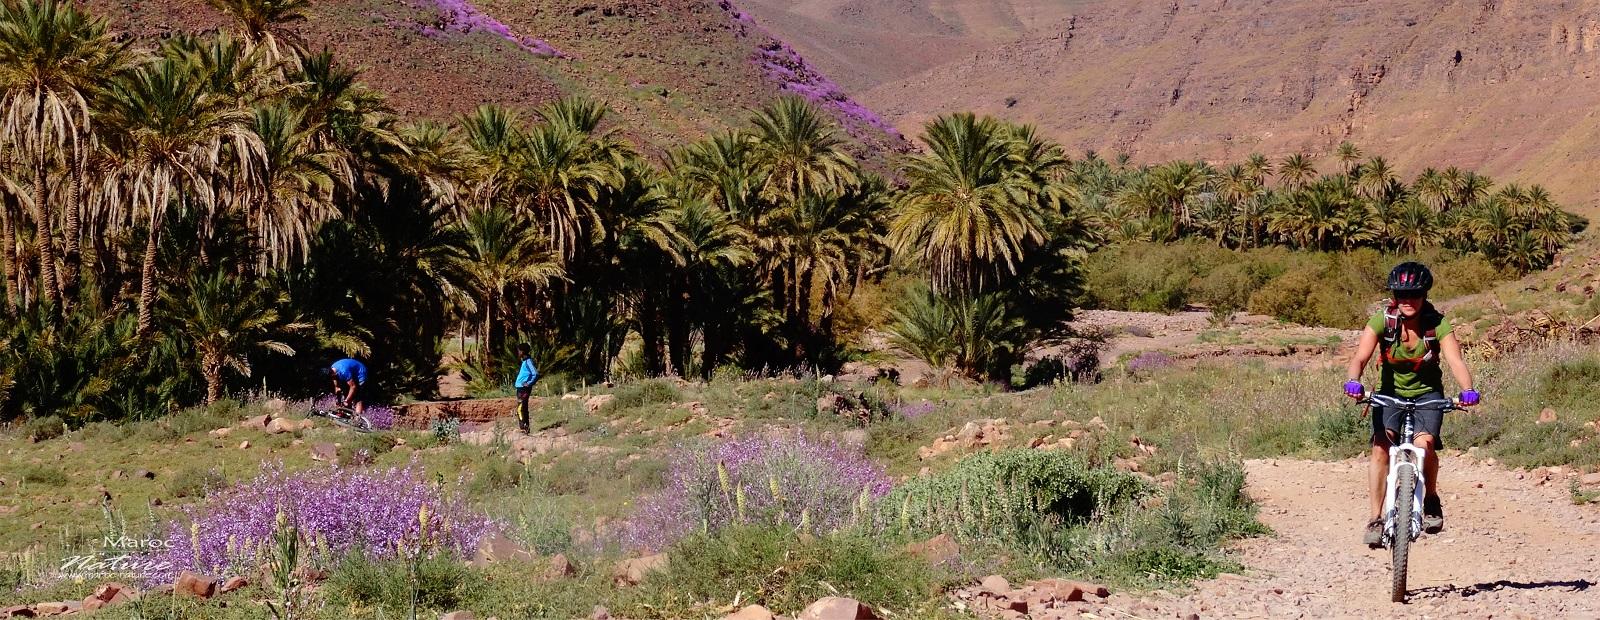 Us Travel Companies Morocco Trips